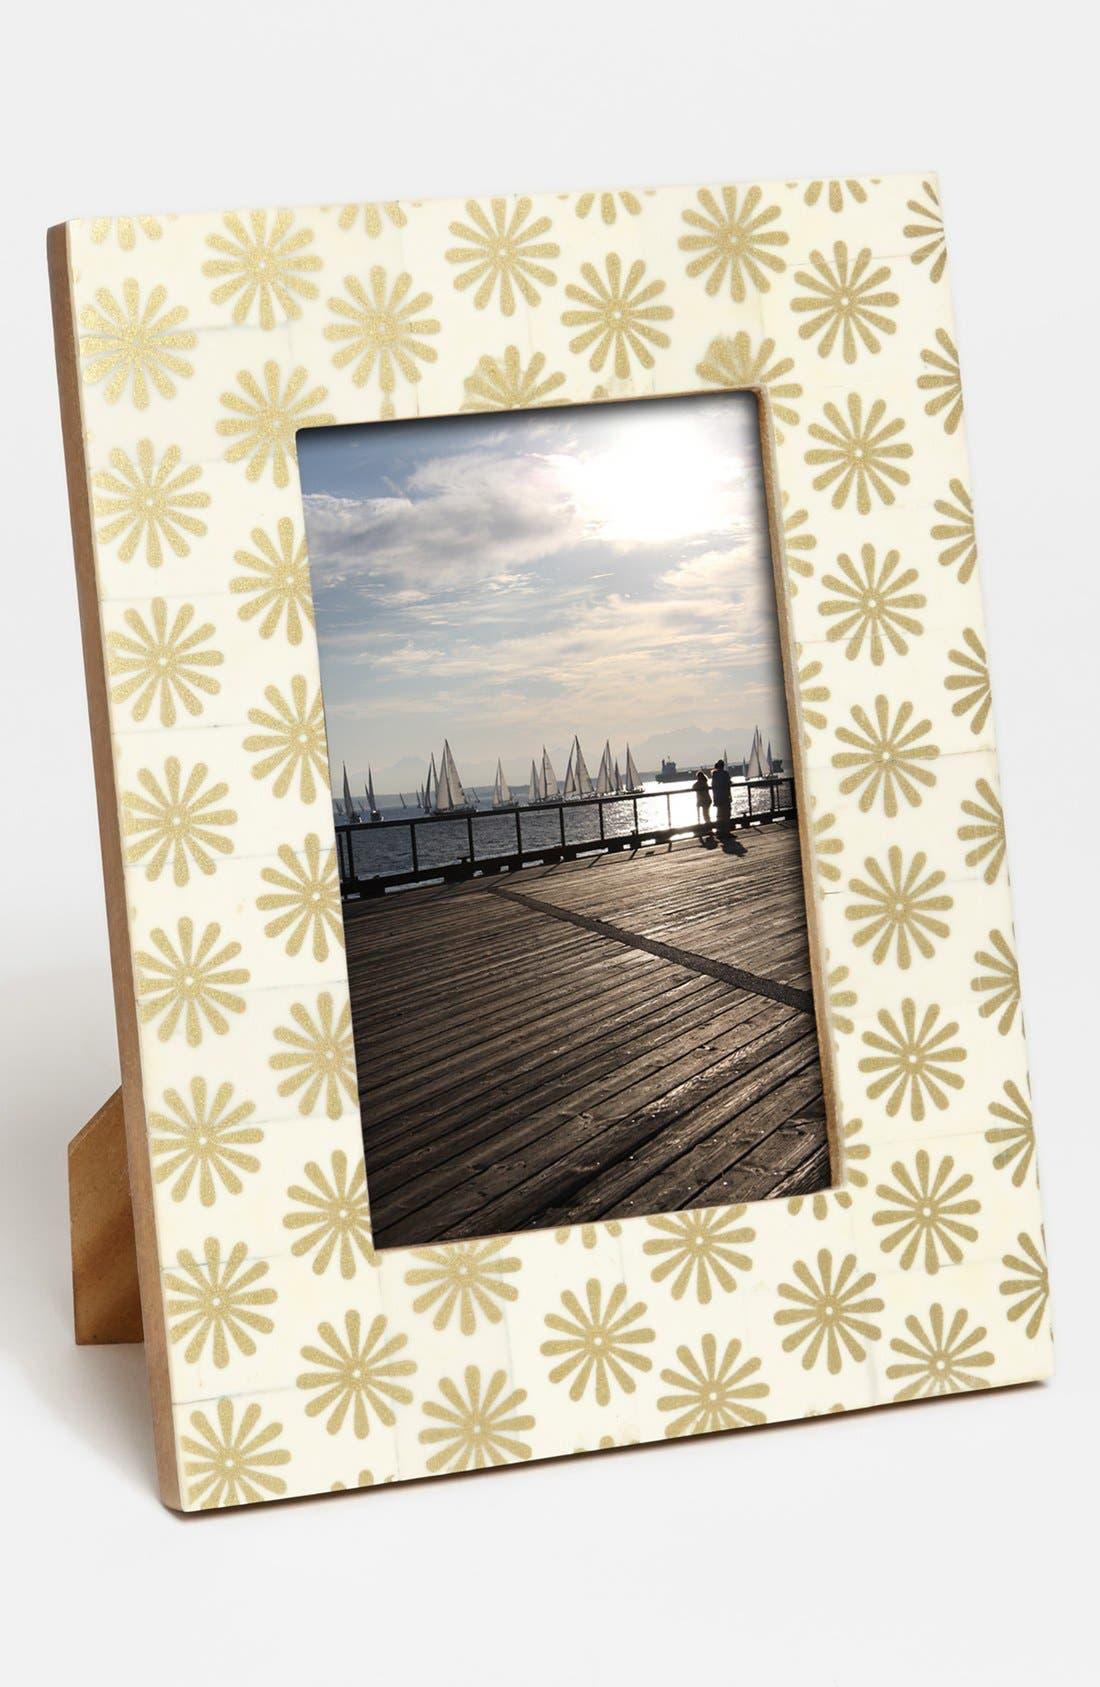 Main Image - 'Sunburst' Picture Frame (4x6)